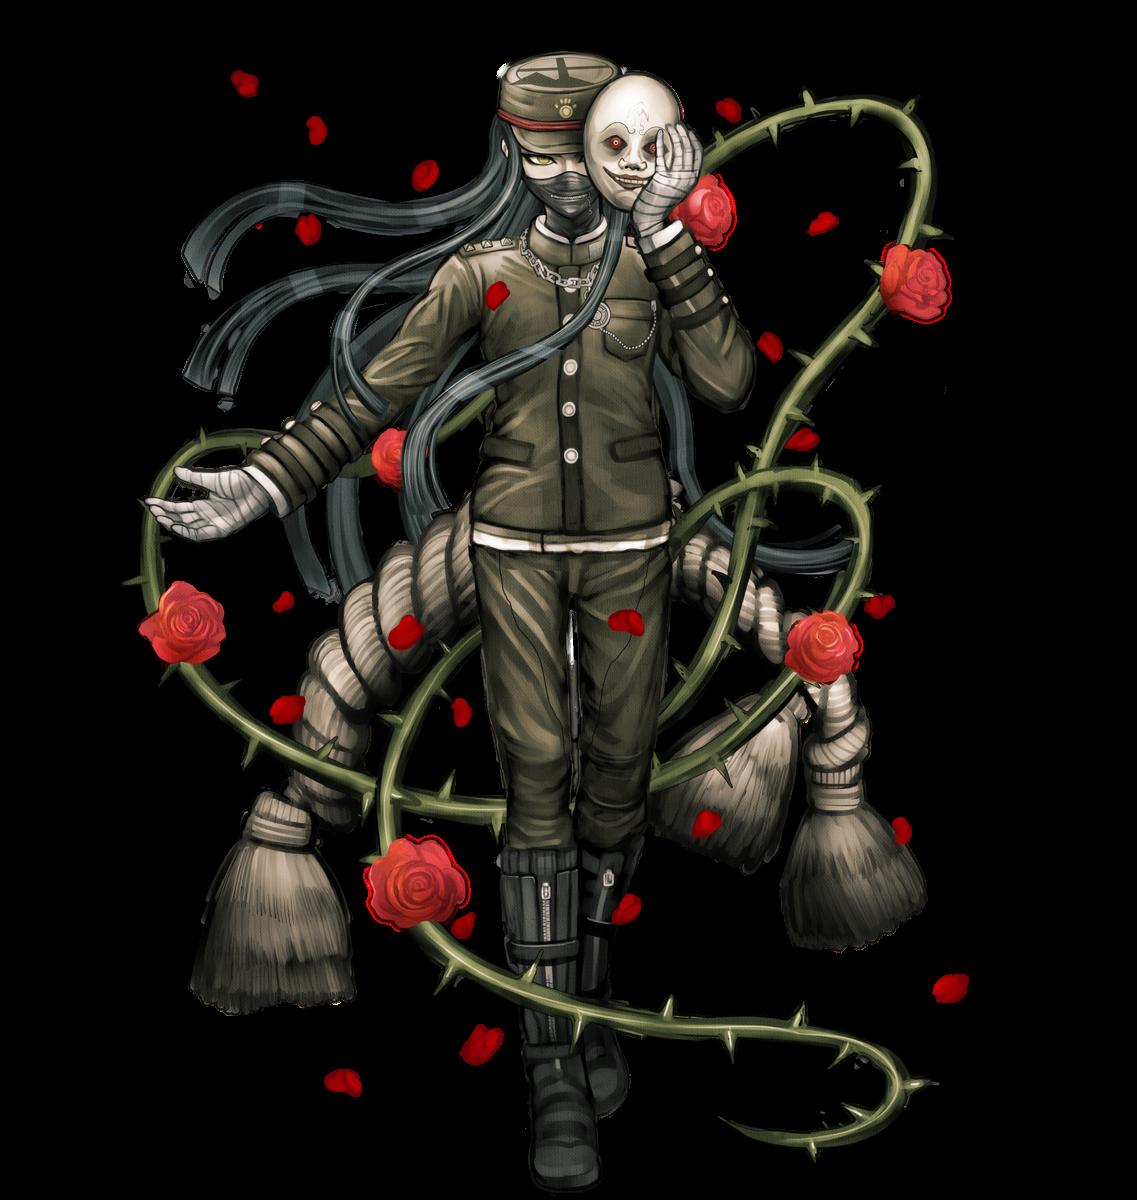 Danganronpa Characters - 0425